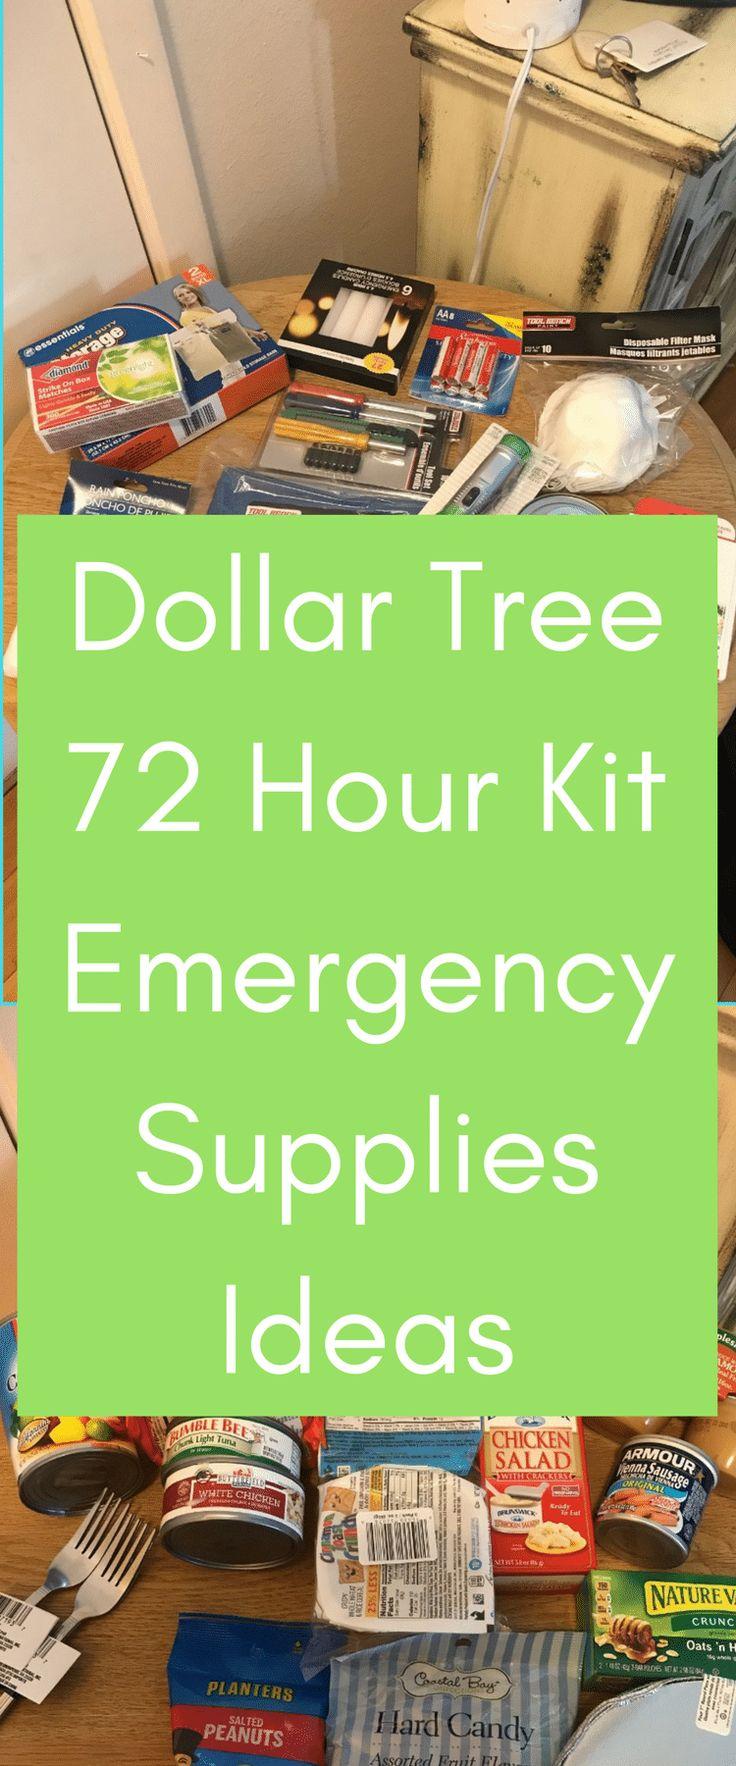 Dollar Tree 72 Hour Kit Ideas